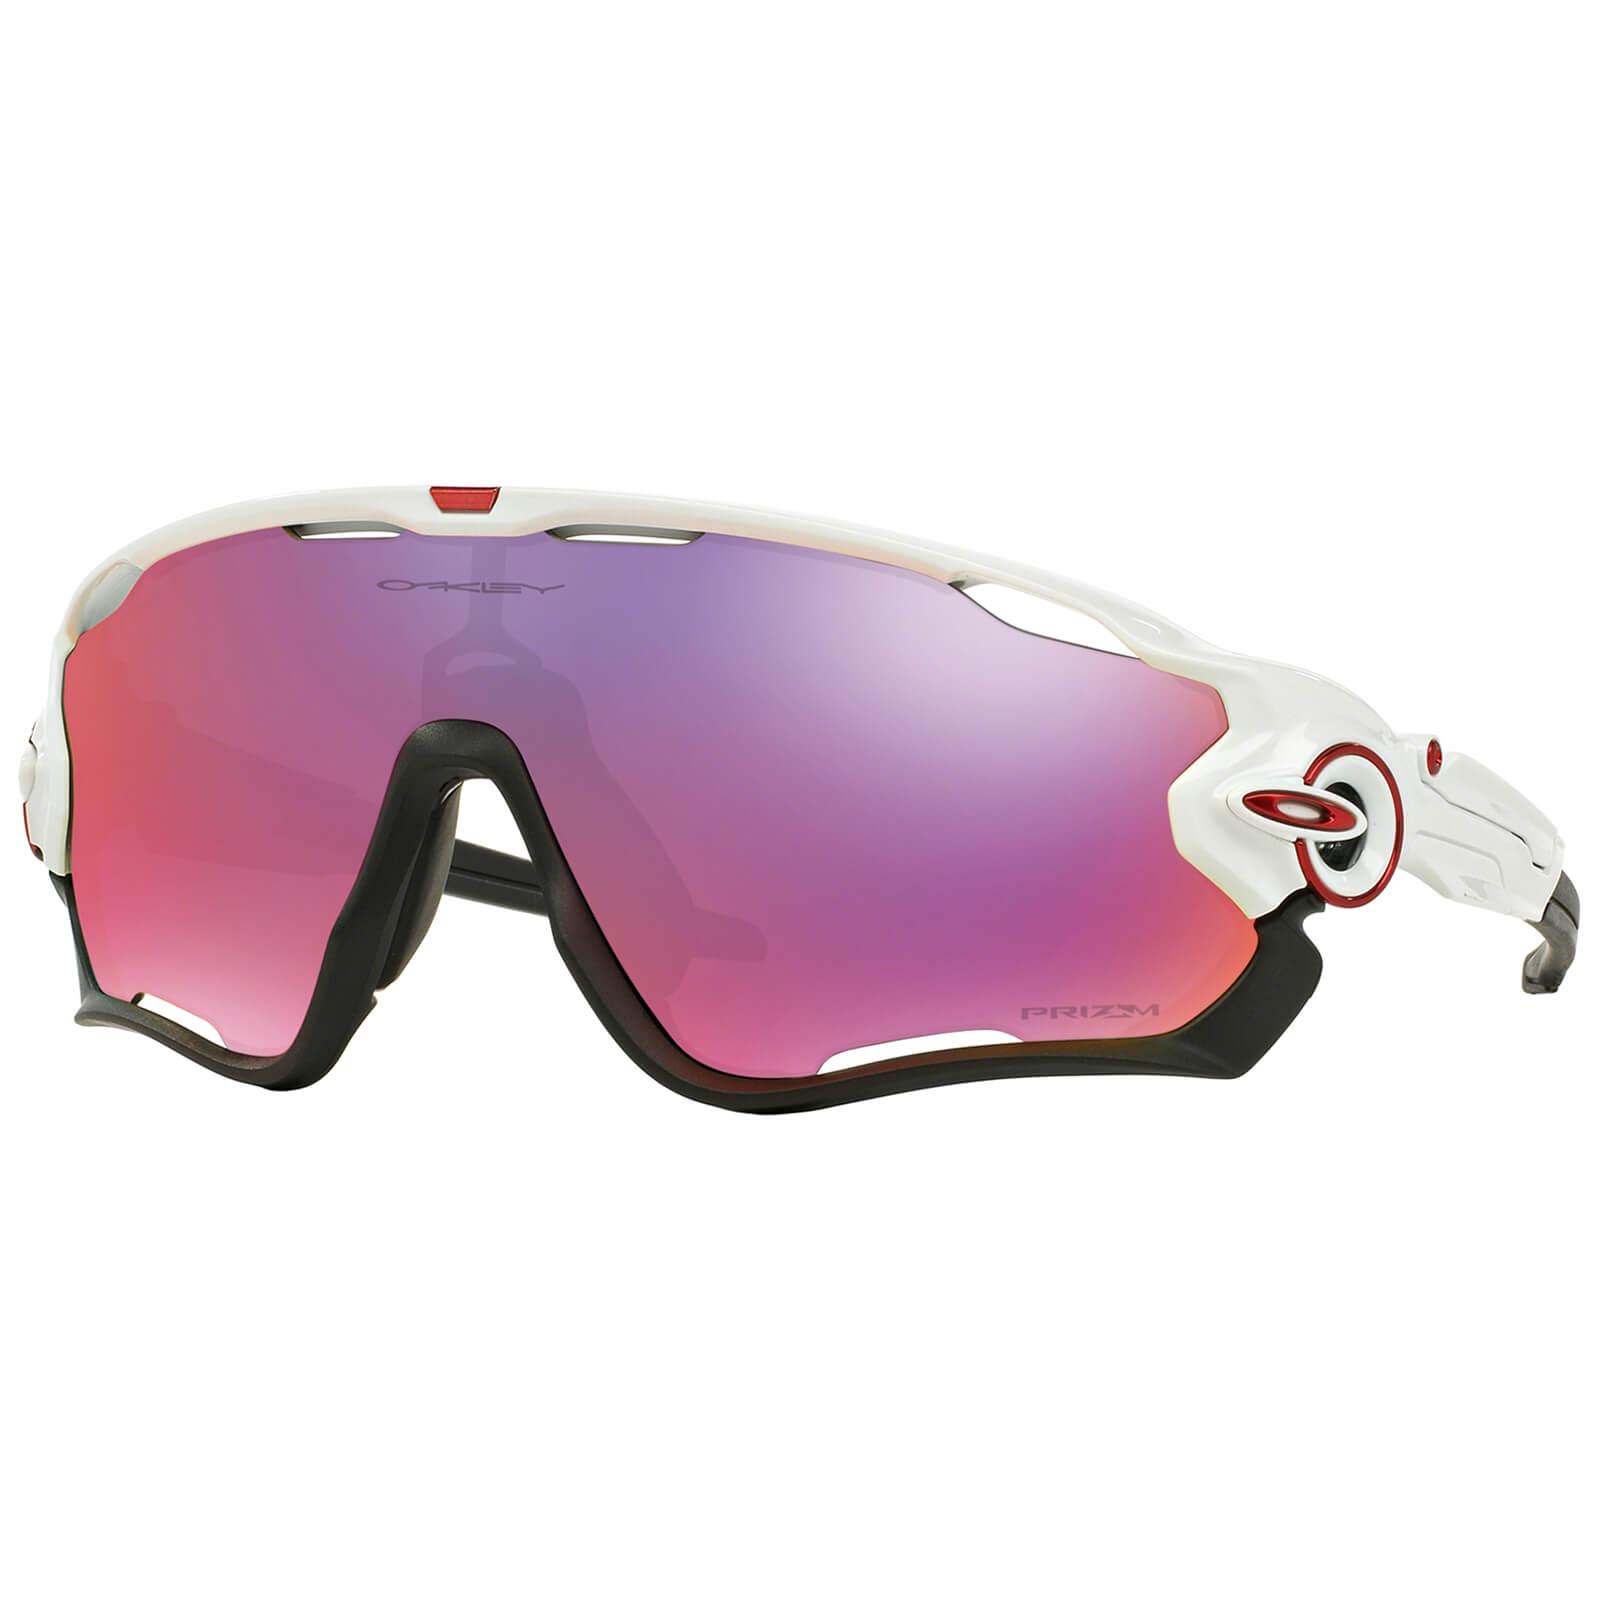 Oakley Jawbreaker Prizm Road Sunglasses - Polished White